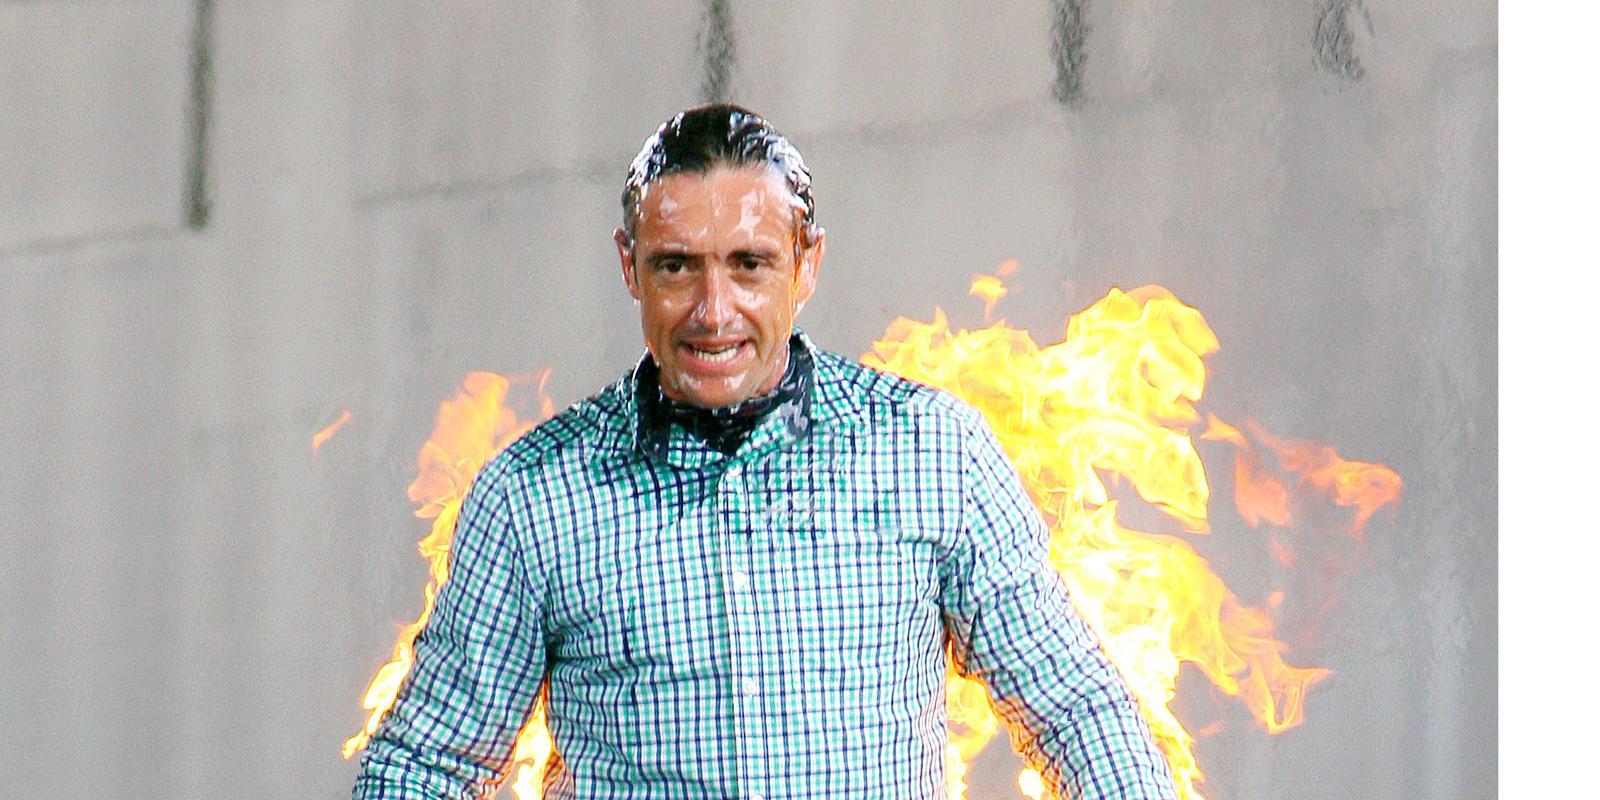 richard hammond set on fire for 39 crash course 39 pictures. Black Bedroom Furniture Sets. Home Design Ideas